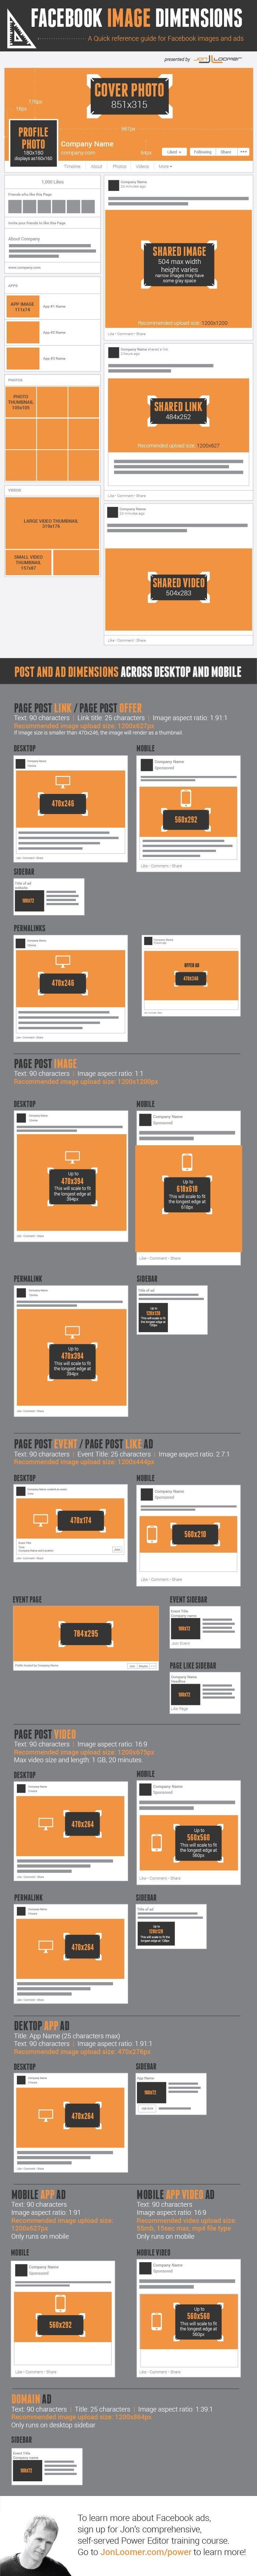 resume templates design facebook image dimensions resume